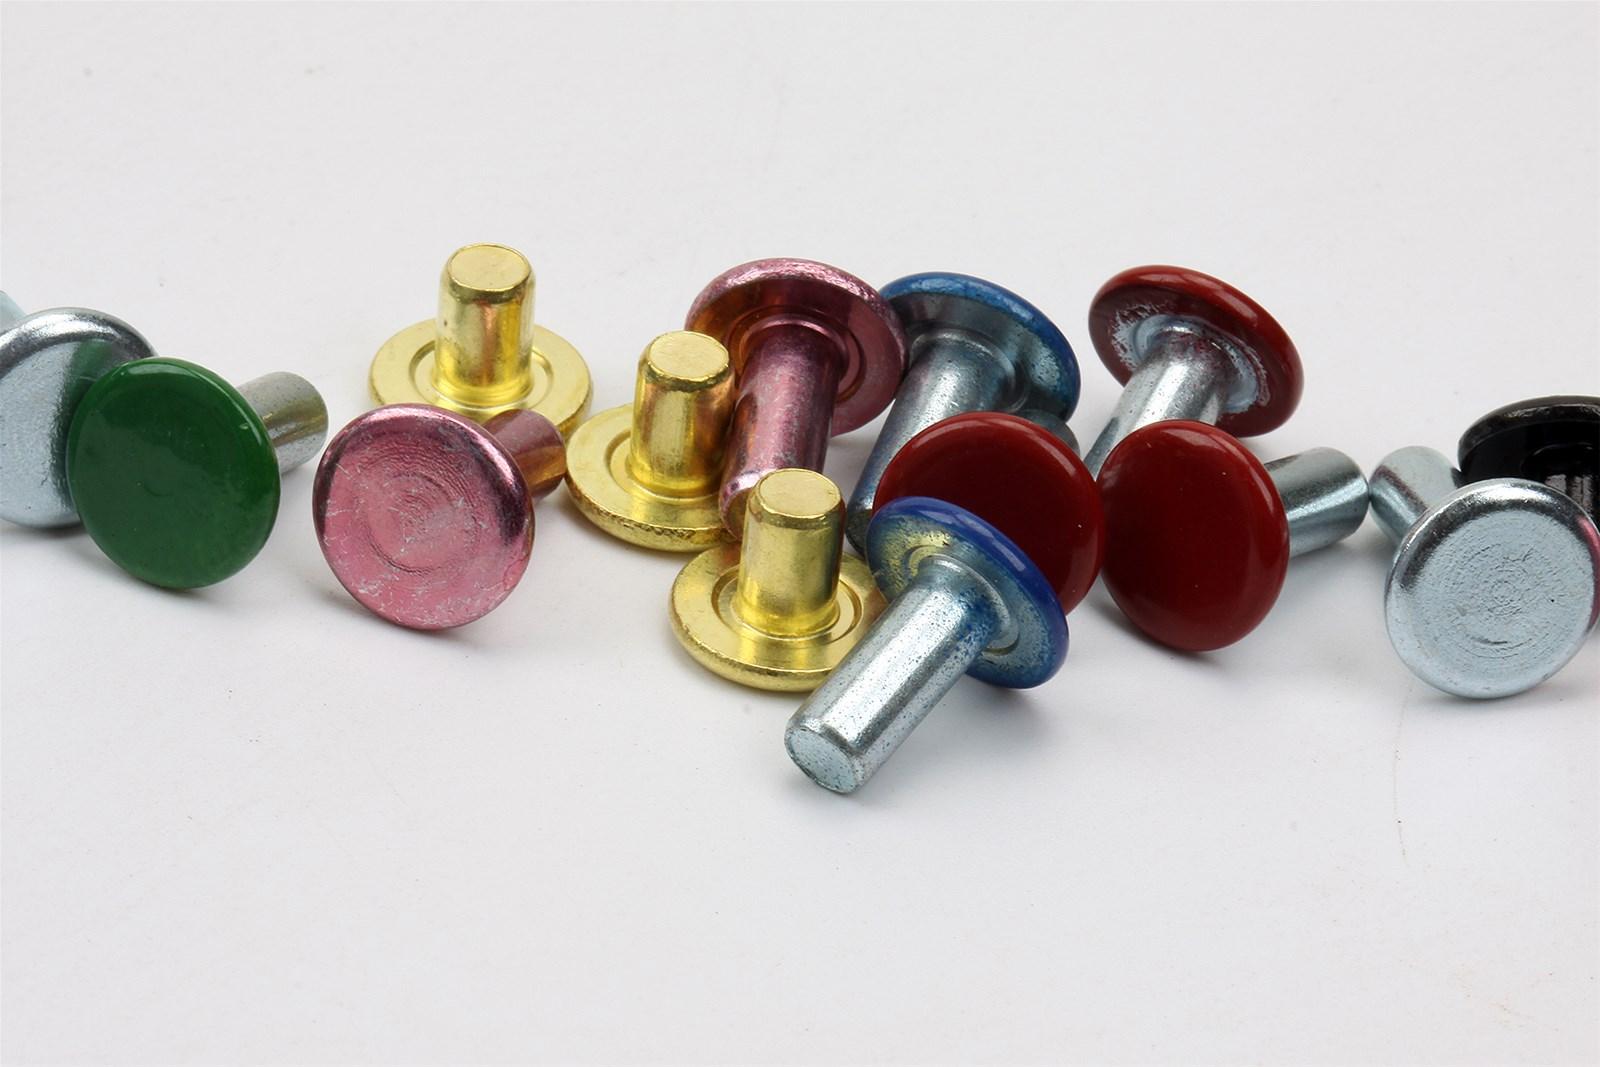 RIVETS shelves rivets fasteners hardware carbon steel brass stainless steel